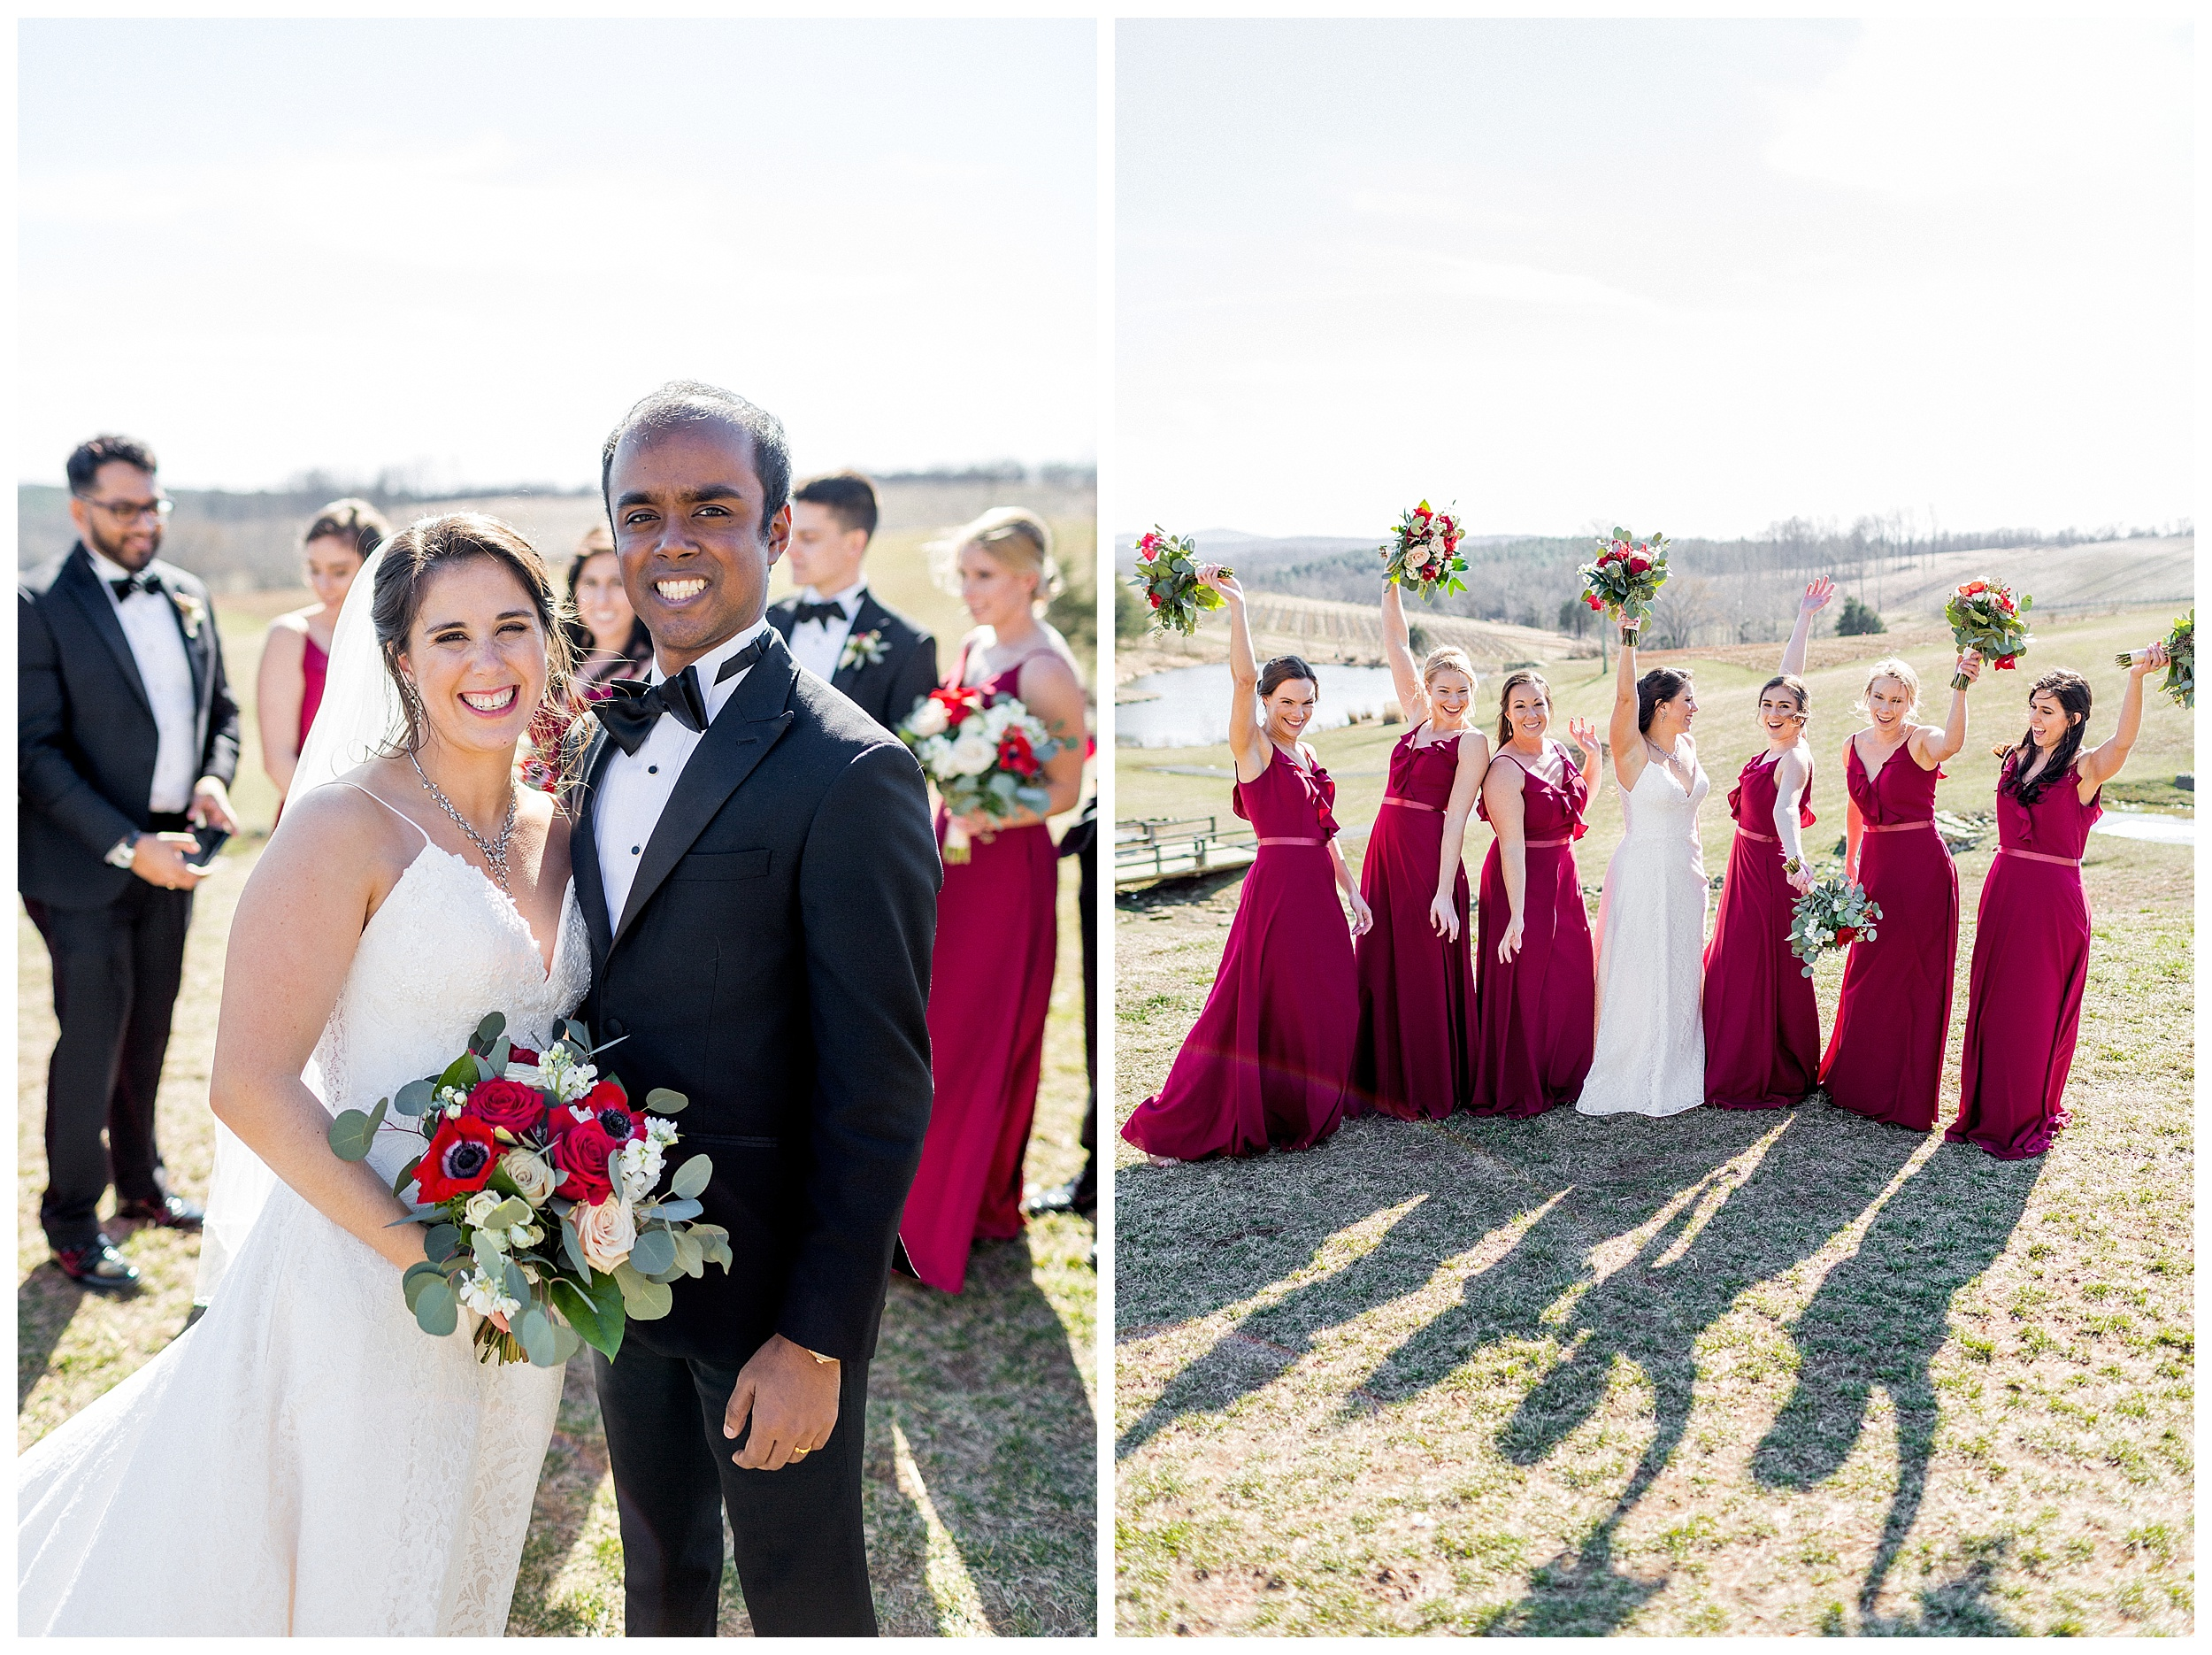 Stone Tower Winery Wedding | Virginia Winter Wedding | VA Wedding Photographer Kir Tuben_0079.jpg